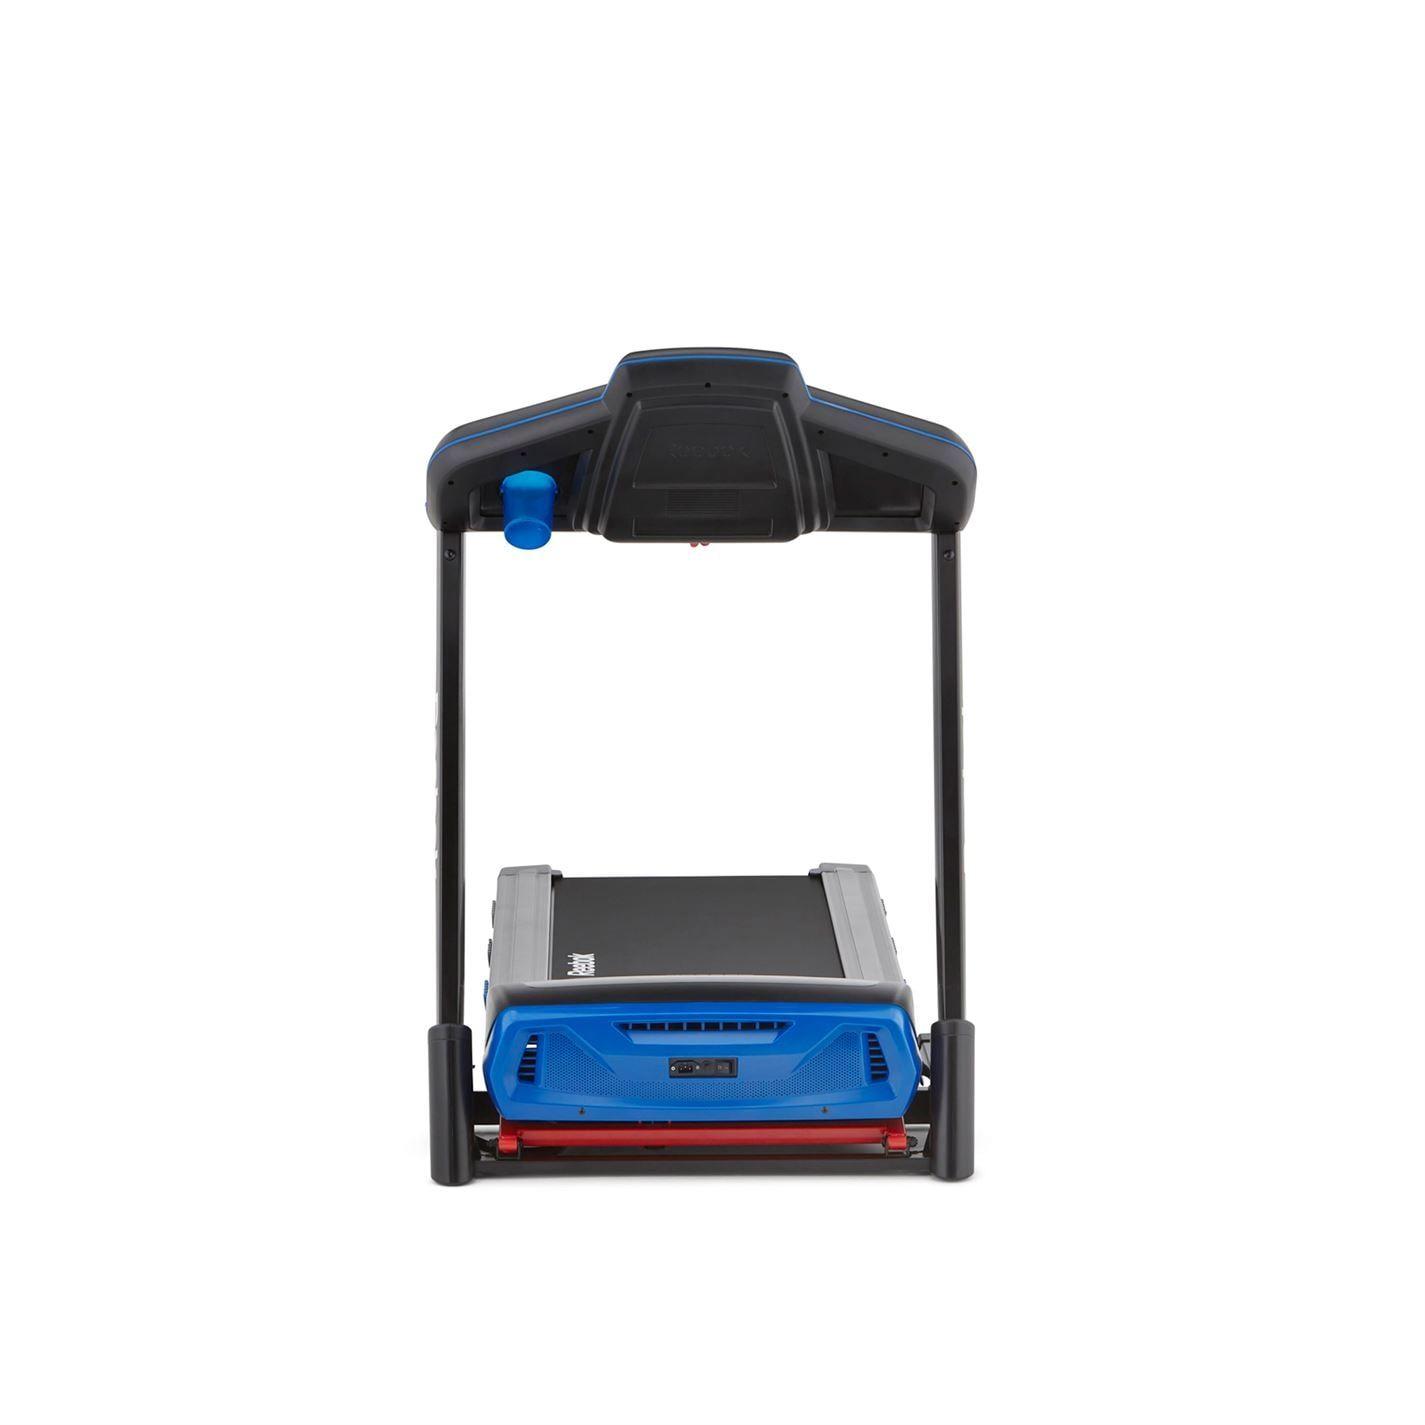 Reebok One Gt60 Treadmill 3